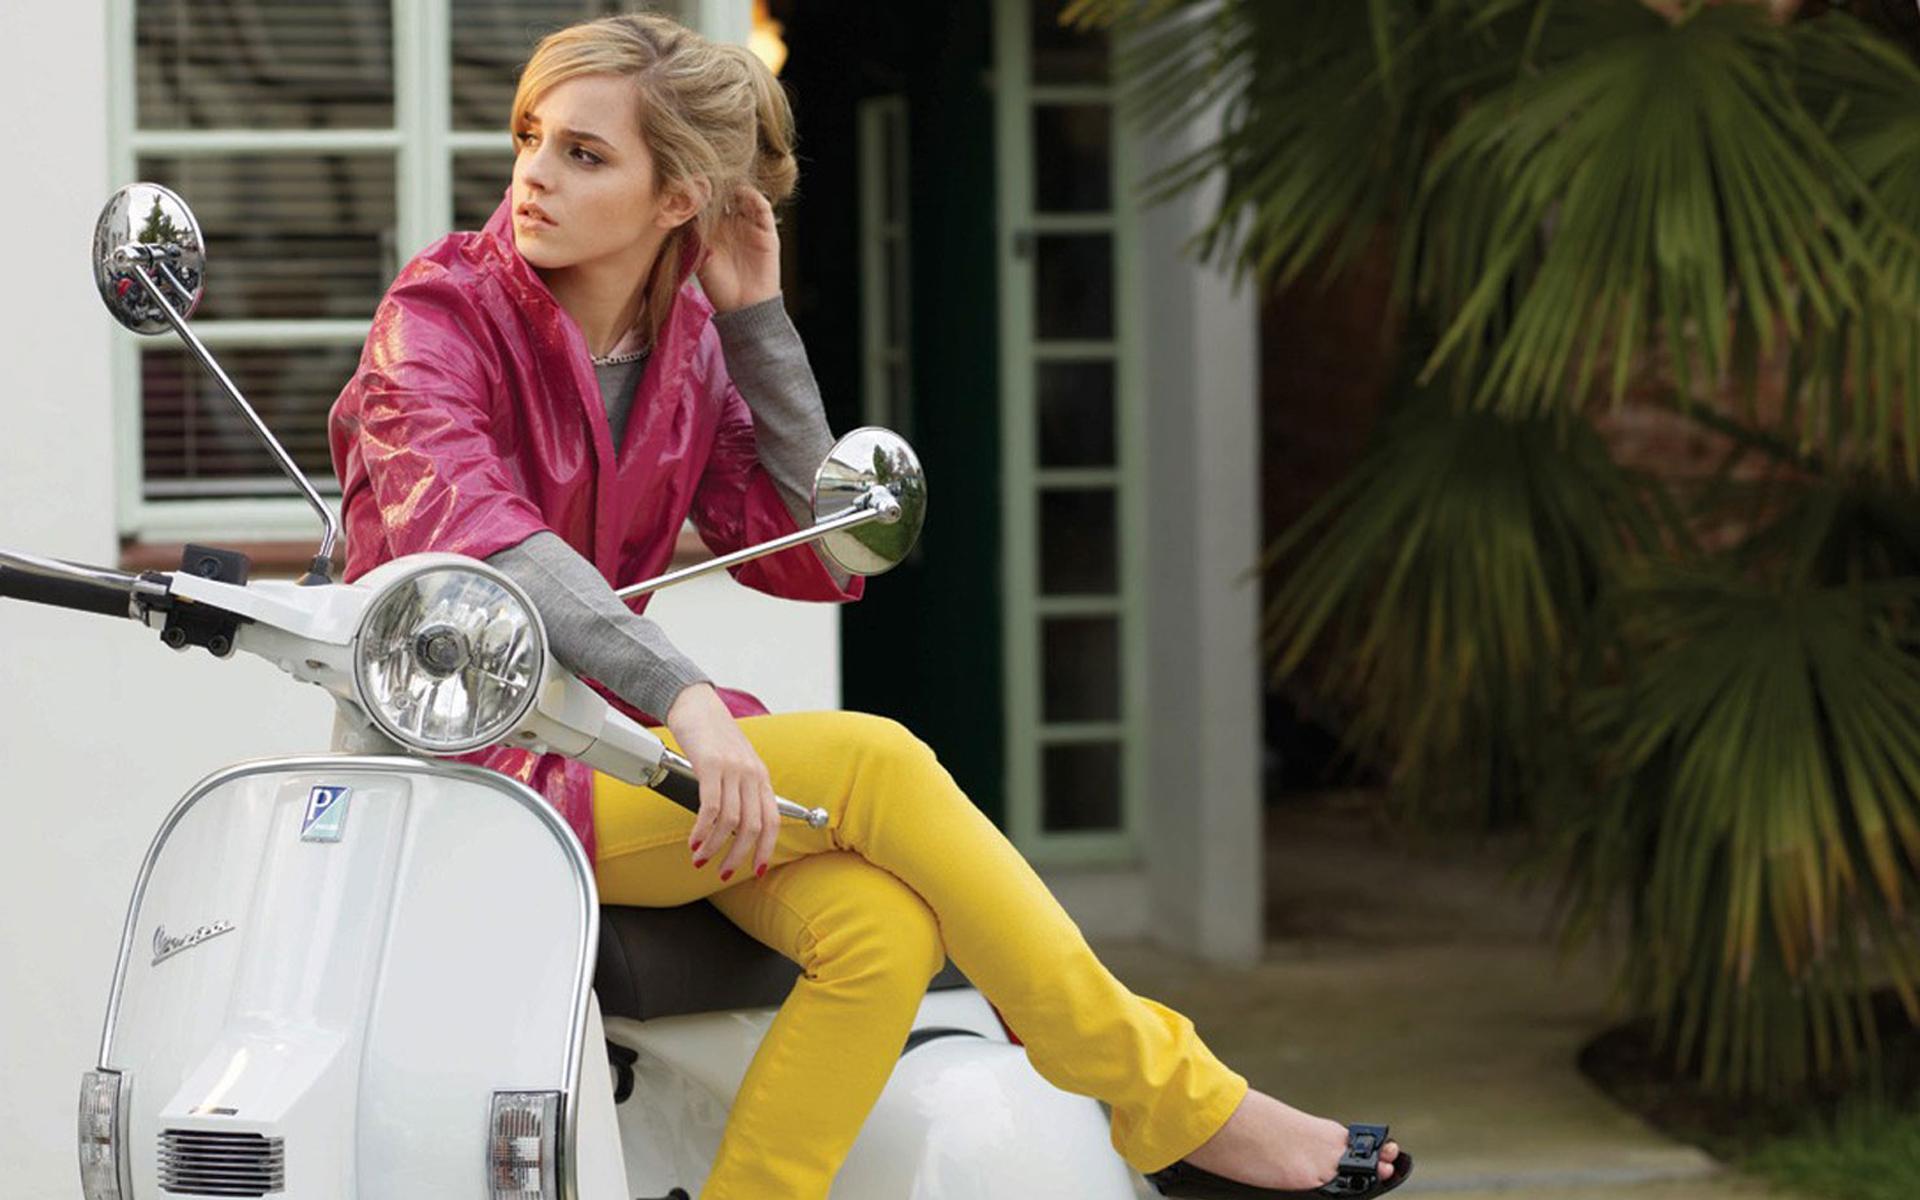 David Beckham Wallpapers Quotes Emma Watson On Scooter Wallpaper Popopics Com